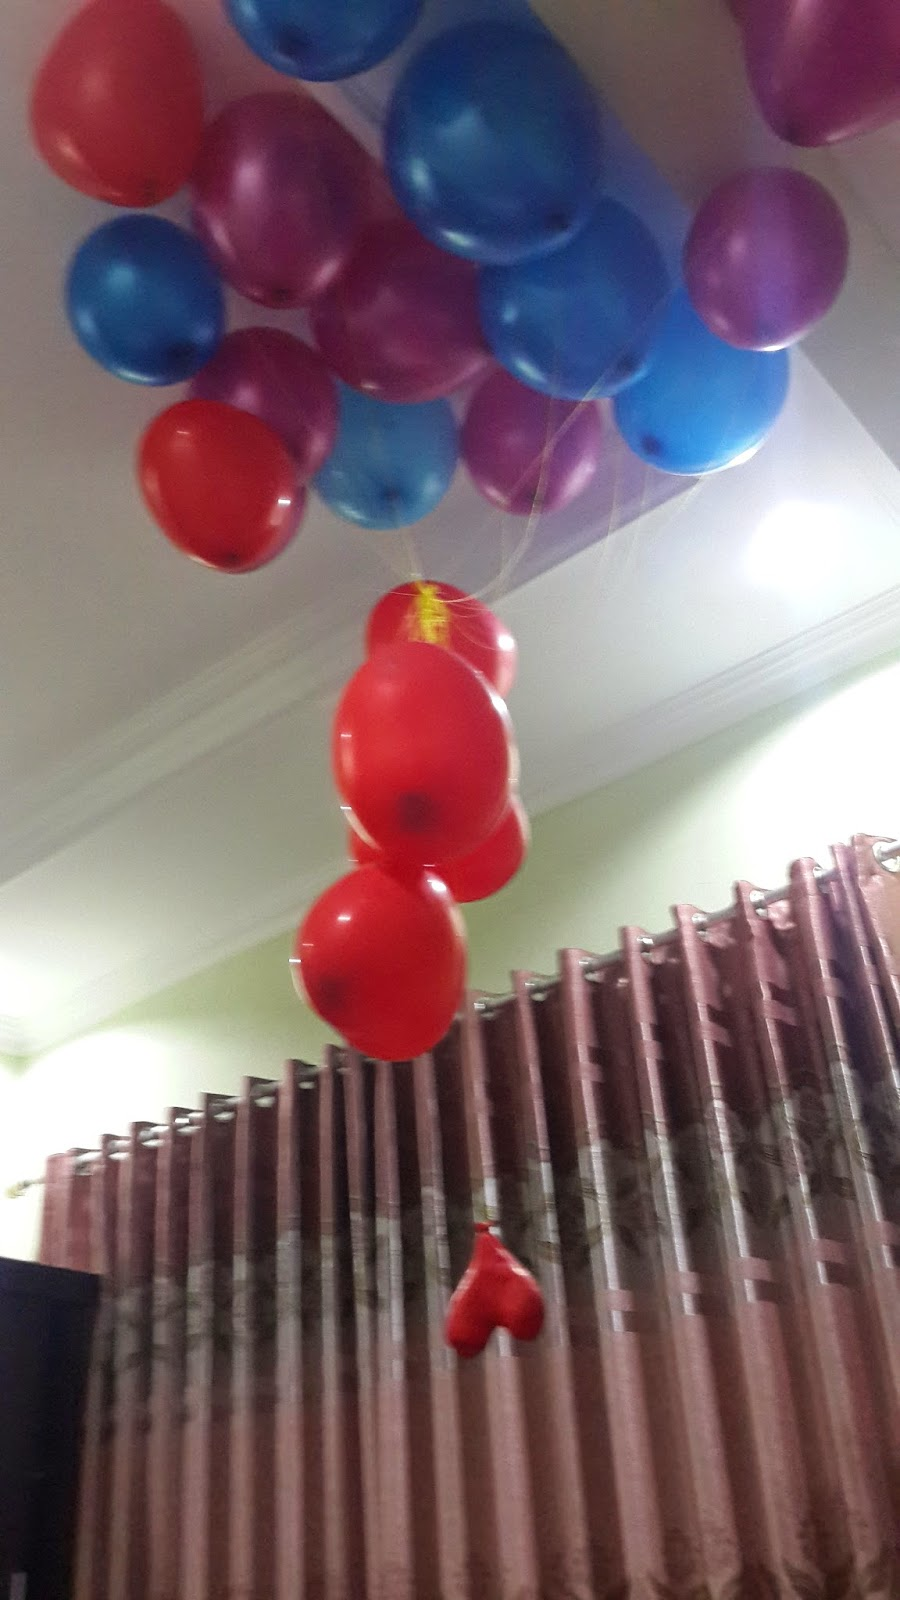 My Life Future Oktober 2014 Balon Huruf Pink Tulisan Nya Ga Jadi Di Tempelin Gara2 Malessssss